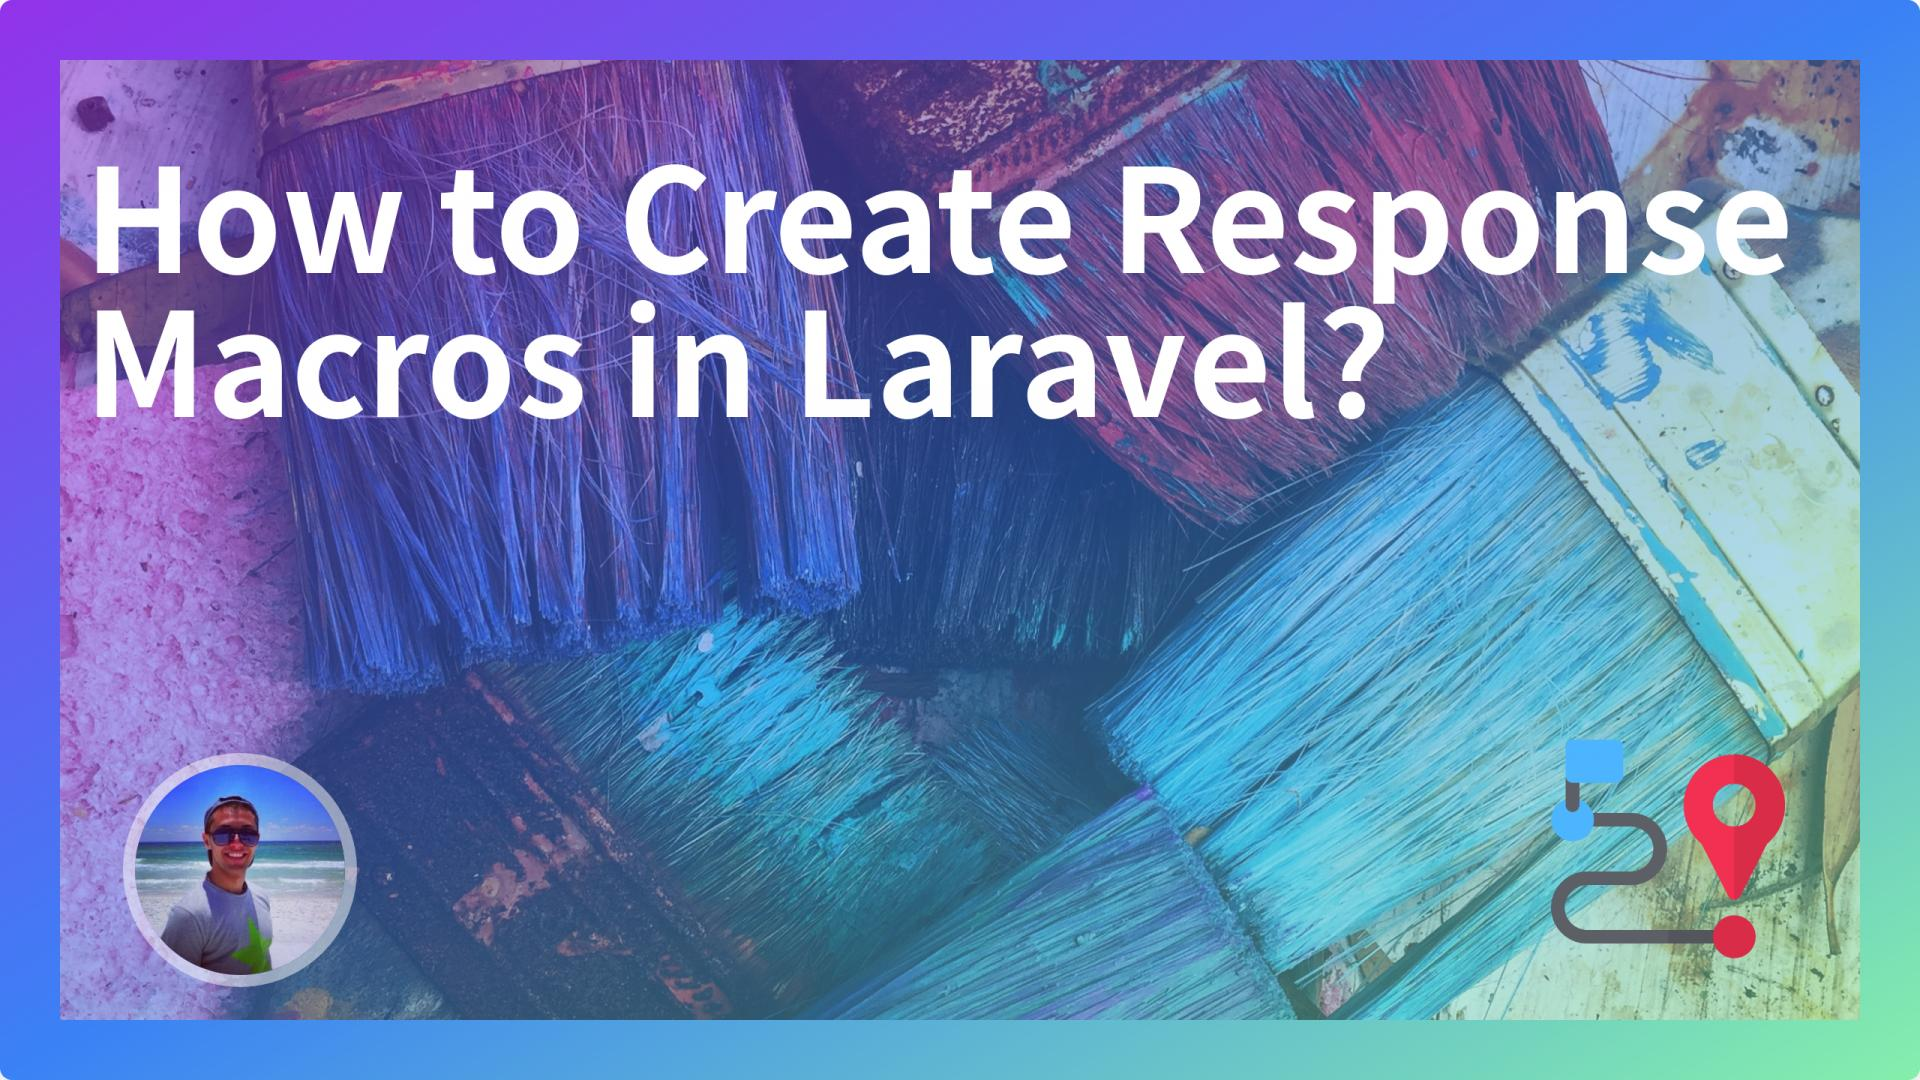 How to Create Response Macros in Laravel?